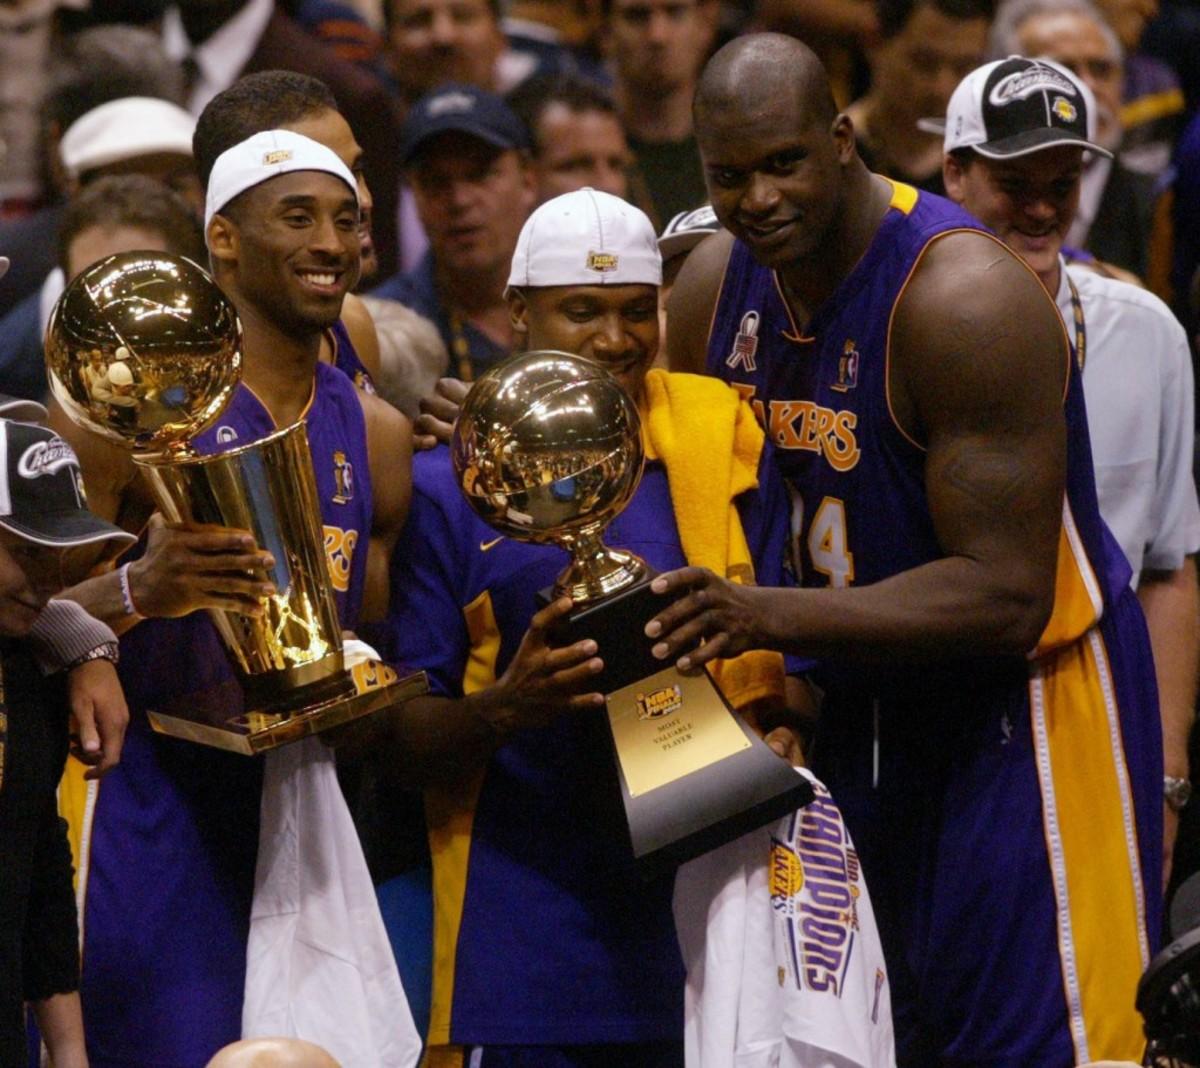 Shaquille O'Neal, Kobe Bryant and Derek Fisher